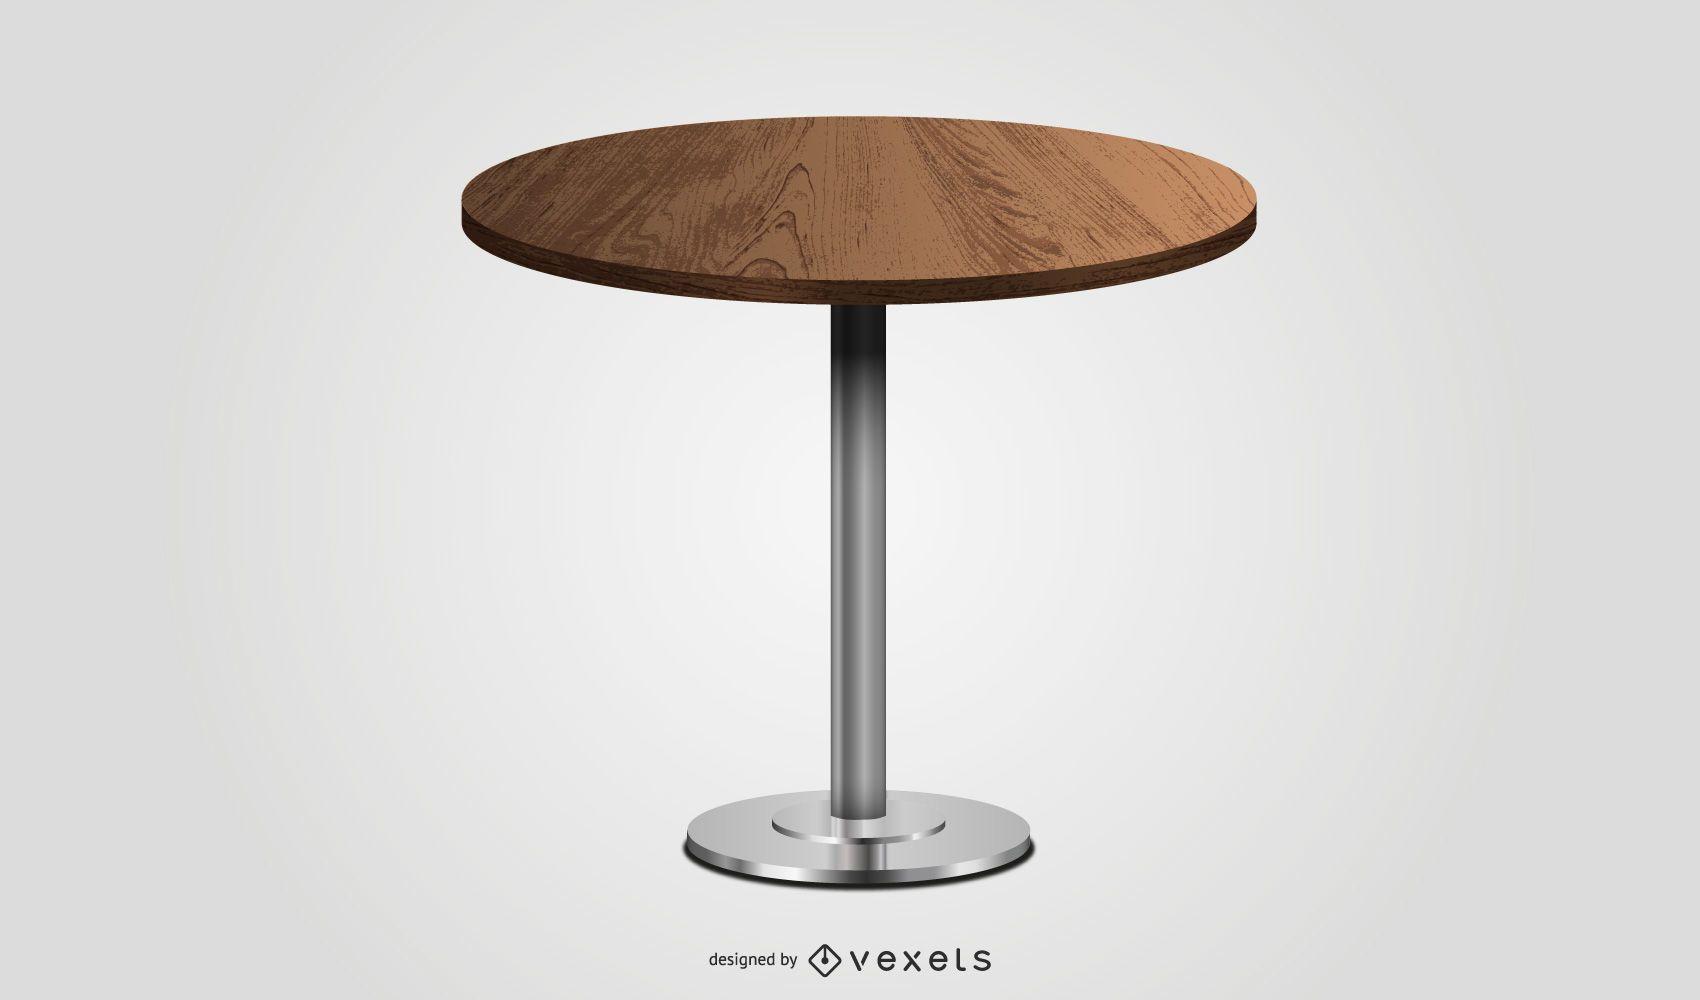 round wooden table illustration